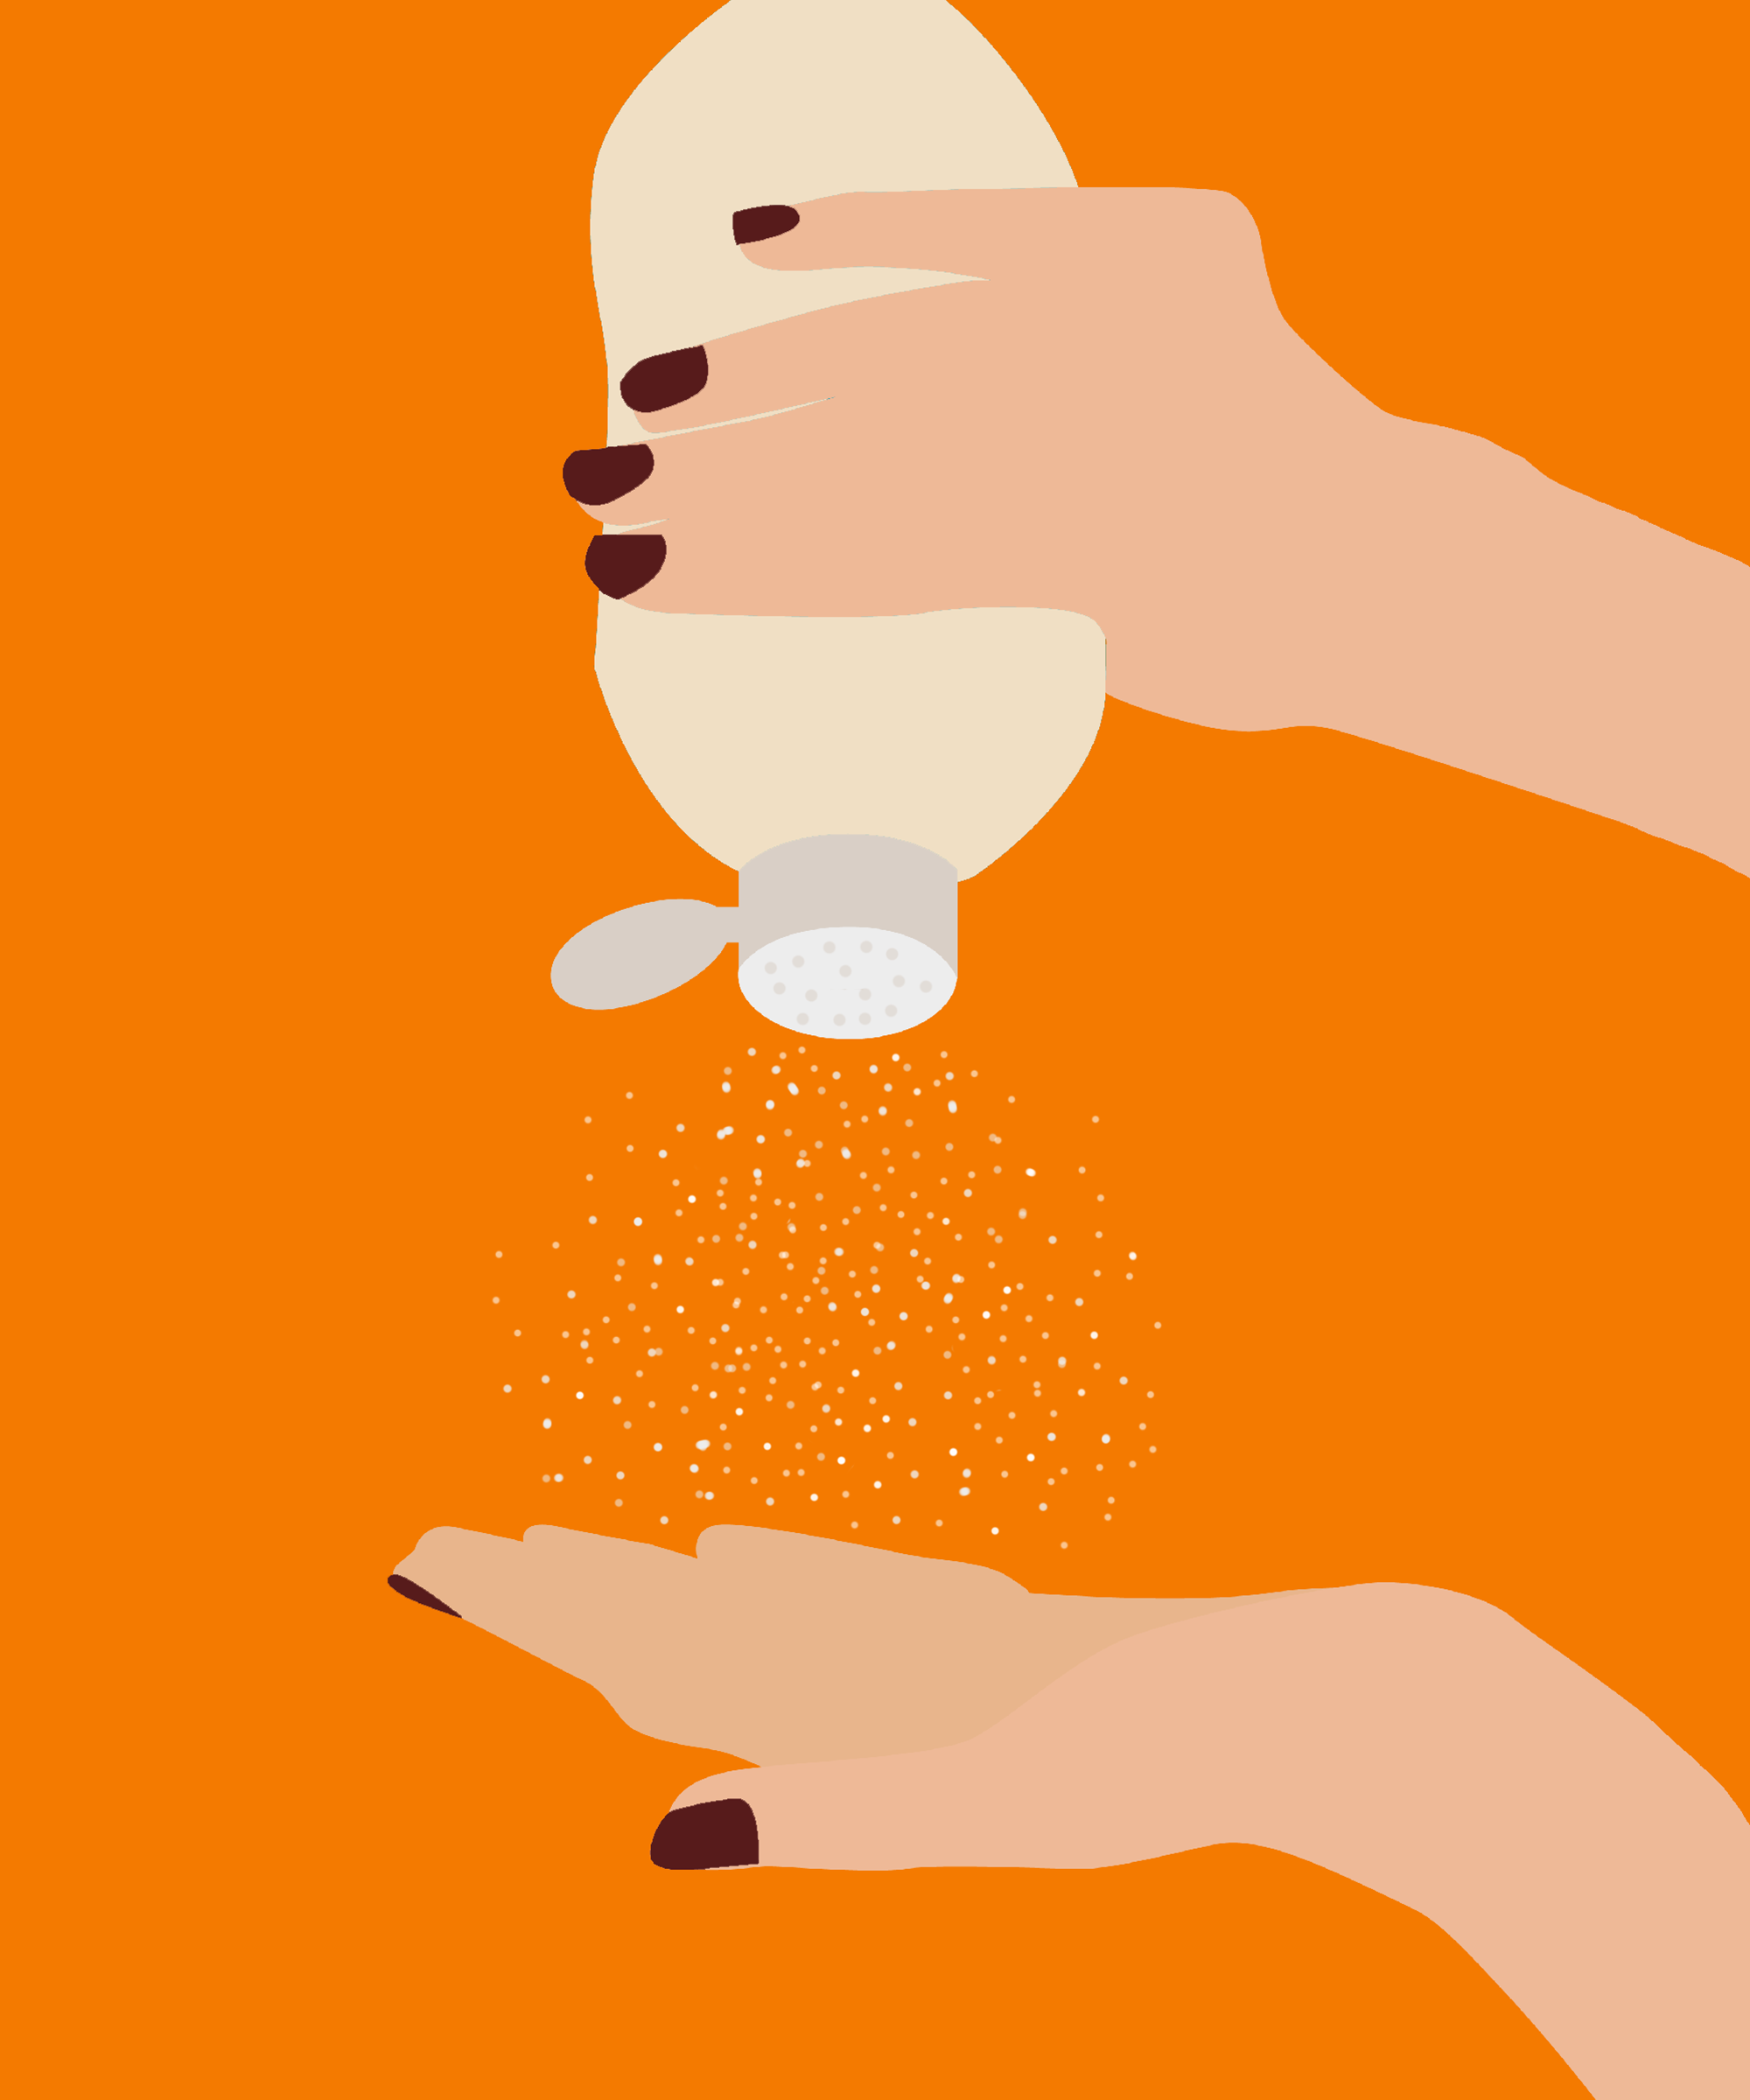 Applying Deodorant Stock Illustrations – 68 Applying Deodorant Stock  Illustrations, Vectors & Clipart - Dreamstime